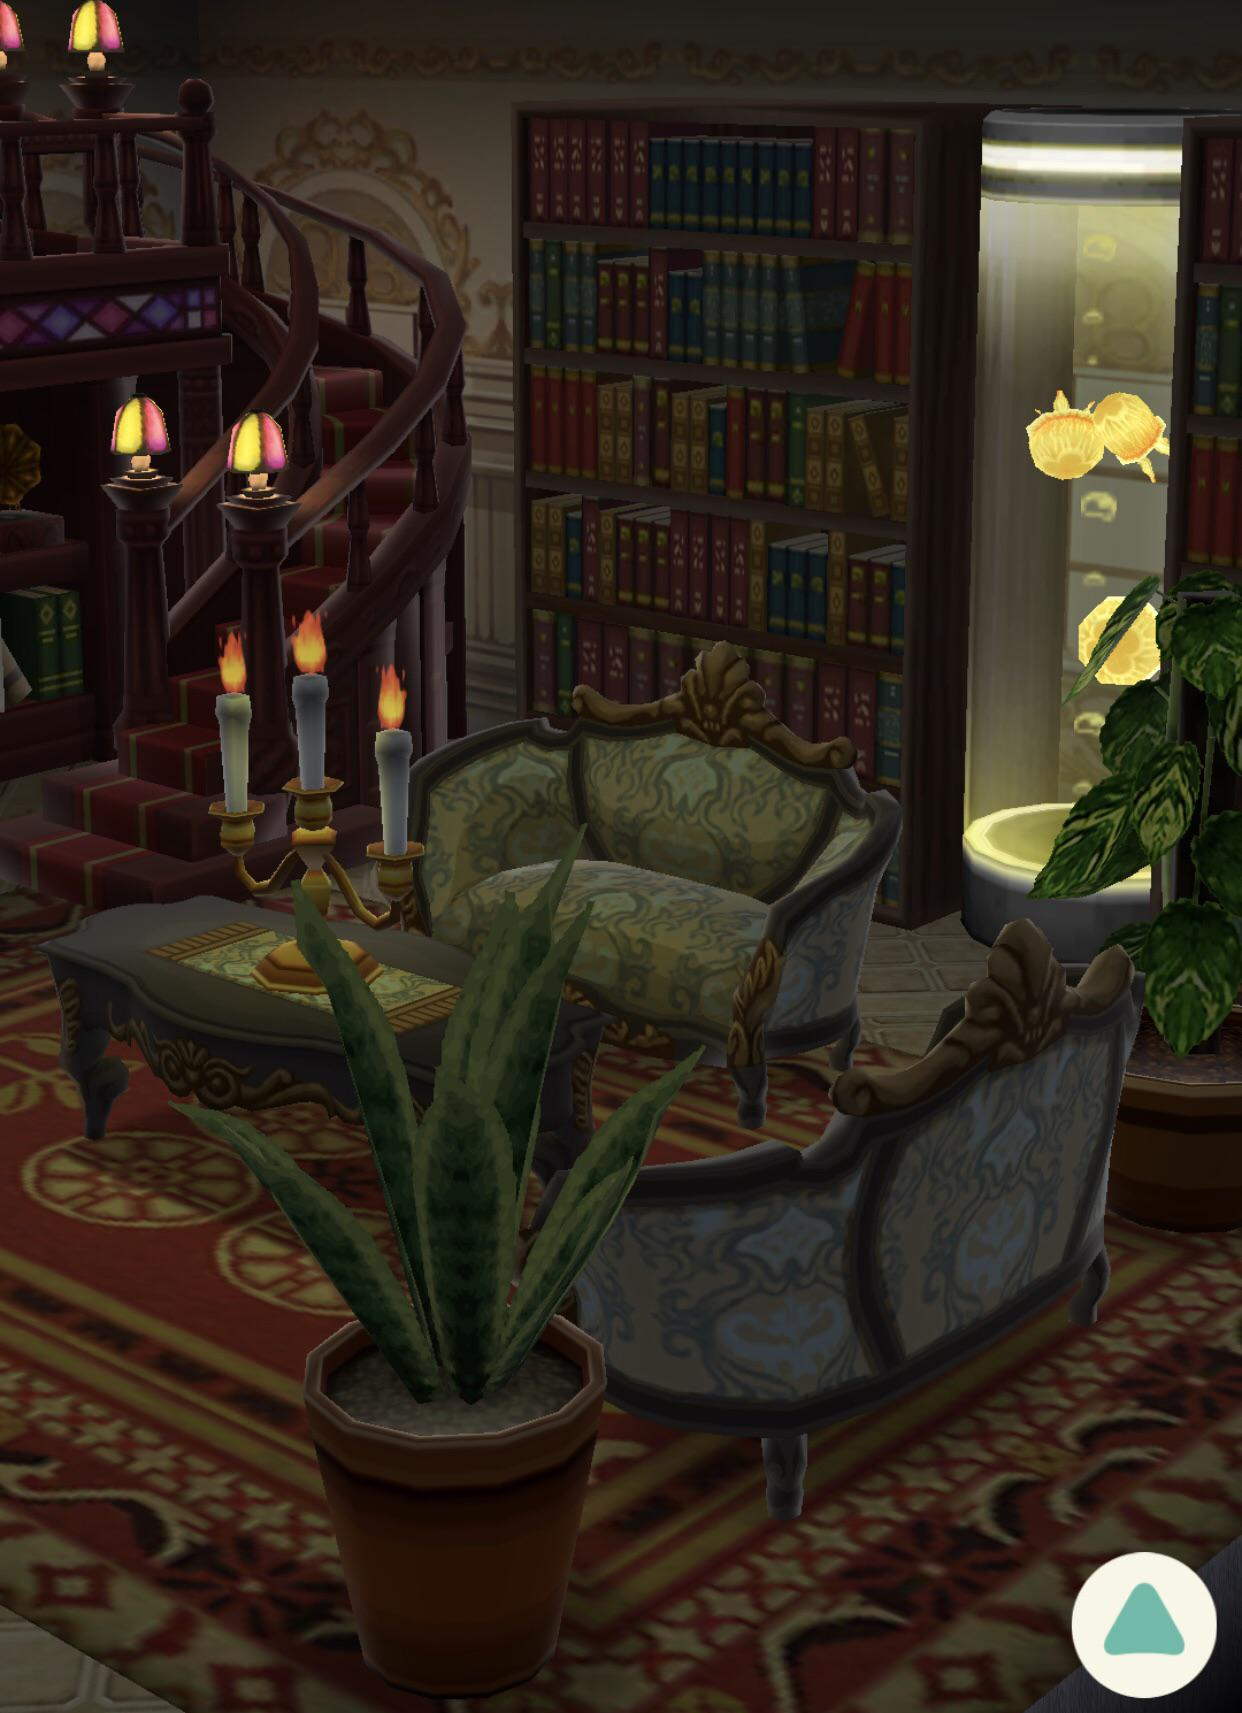 Secret Room Through The Hidden Bookcase Door Acpocketcamp